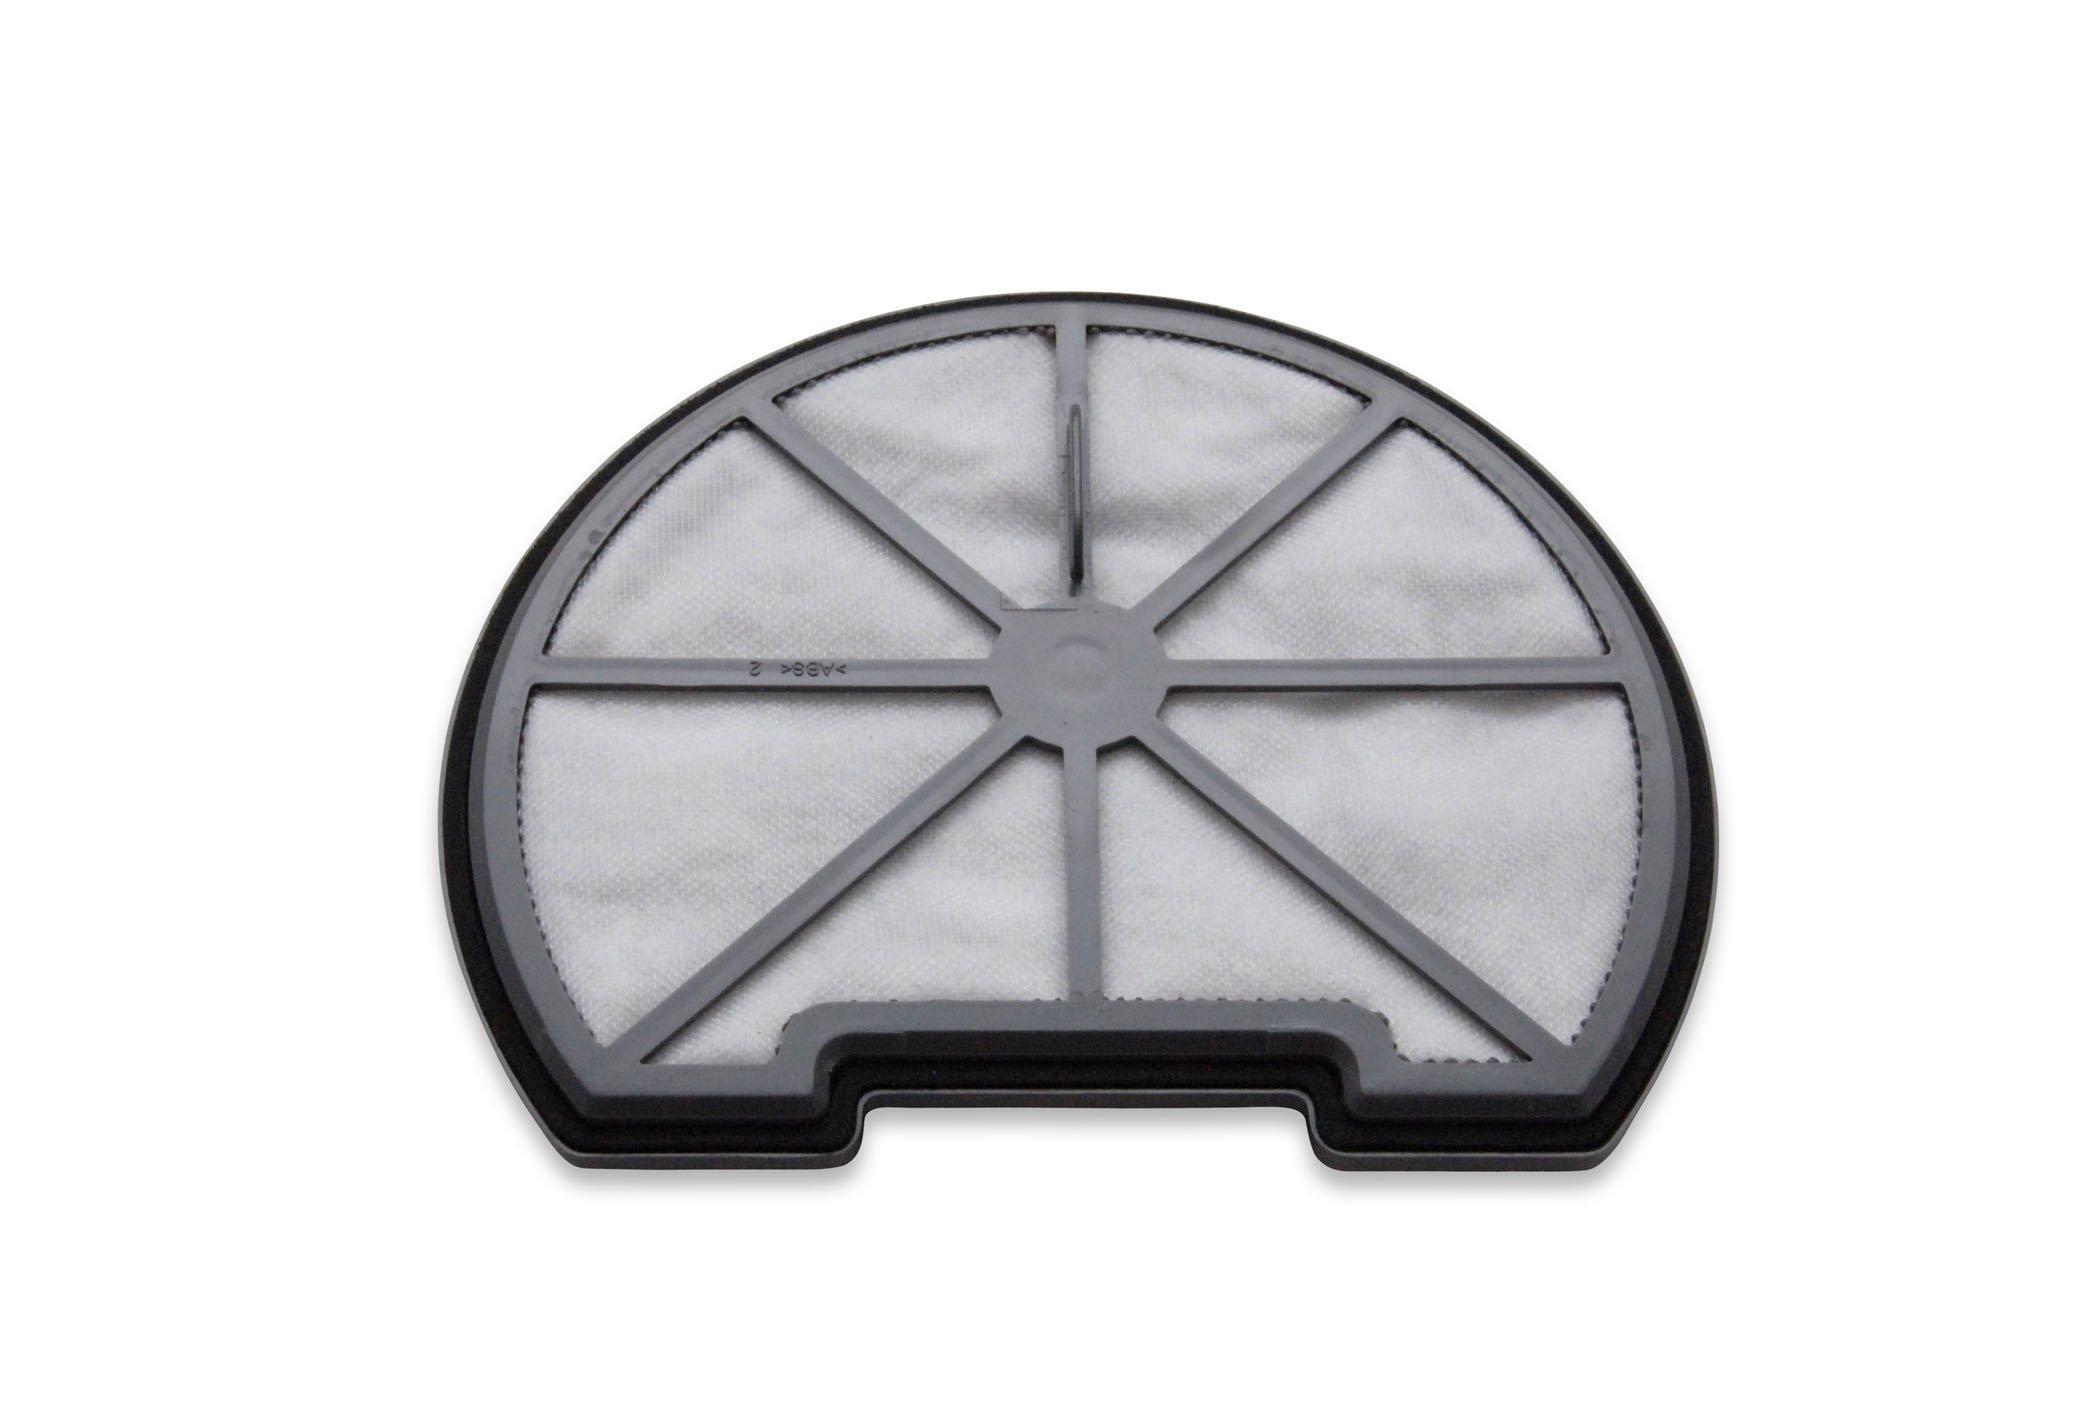 Filter Pack - Windtunnel,Mach Uprights2